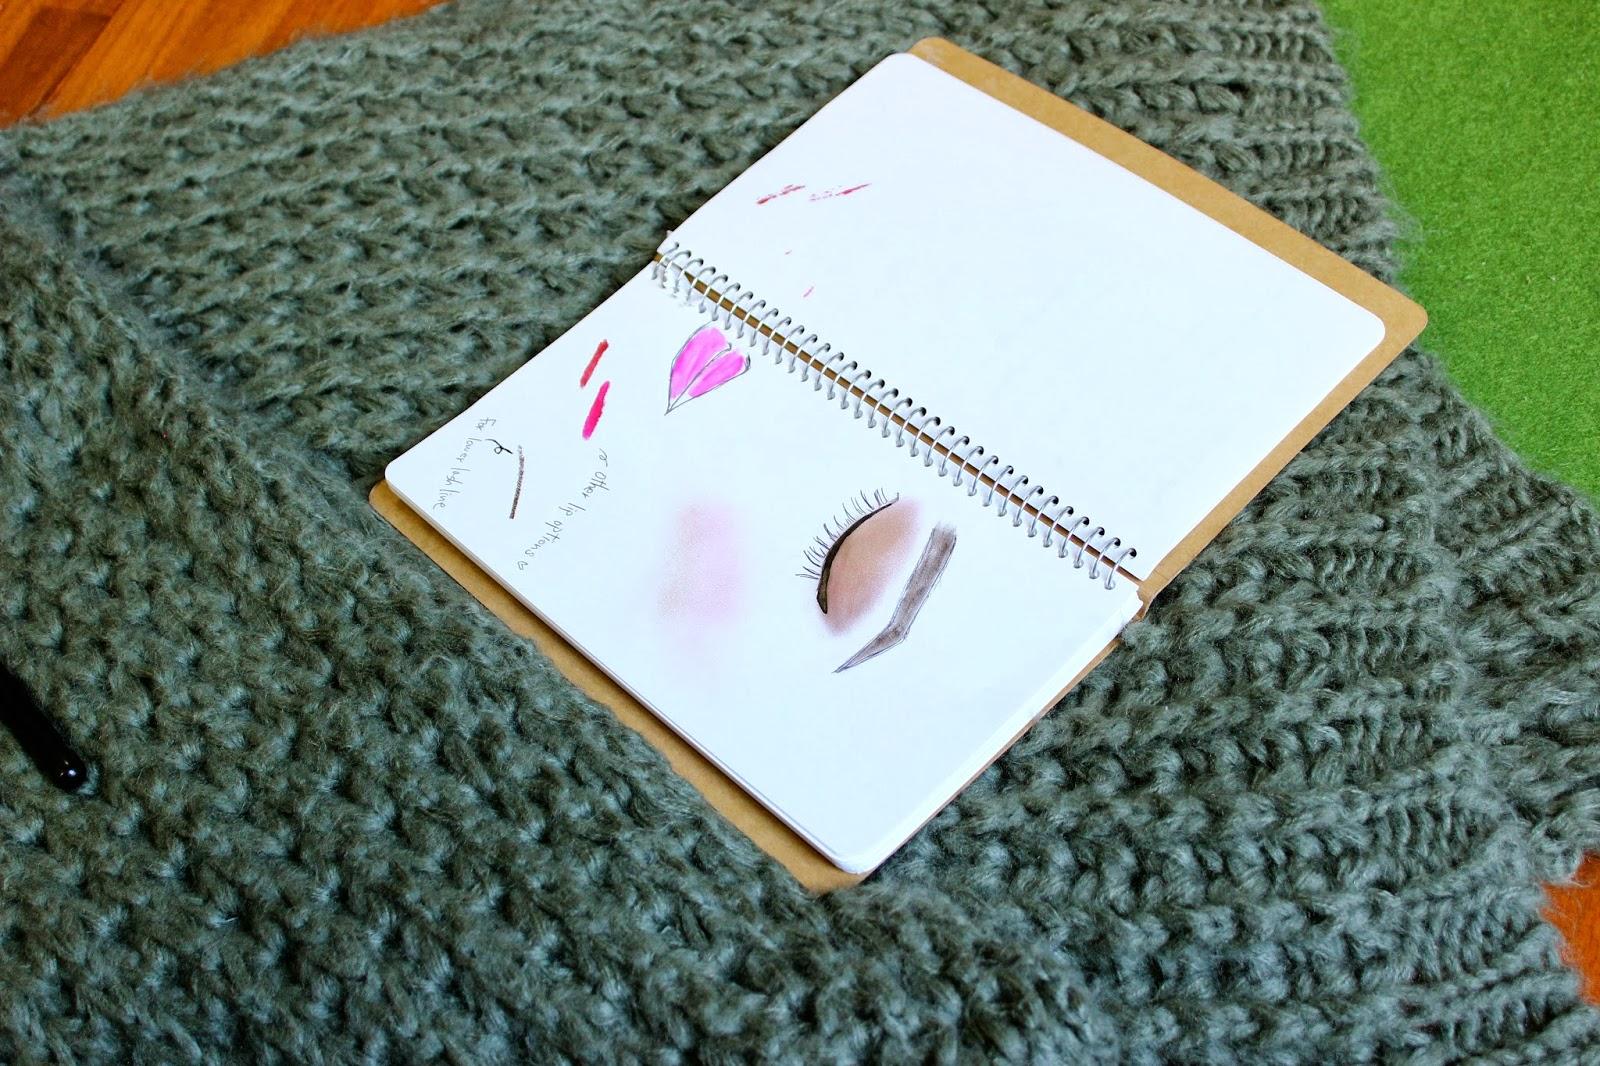 Wearable Dusty Smokey Eyes | Using Smashbox, NARS, MAC, TanyaBurr lip glosses etc.